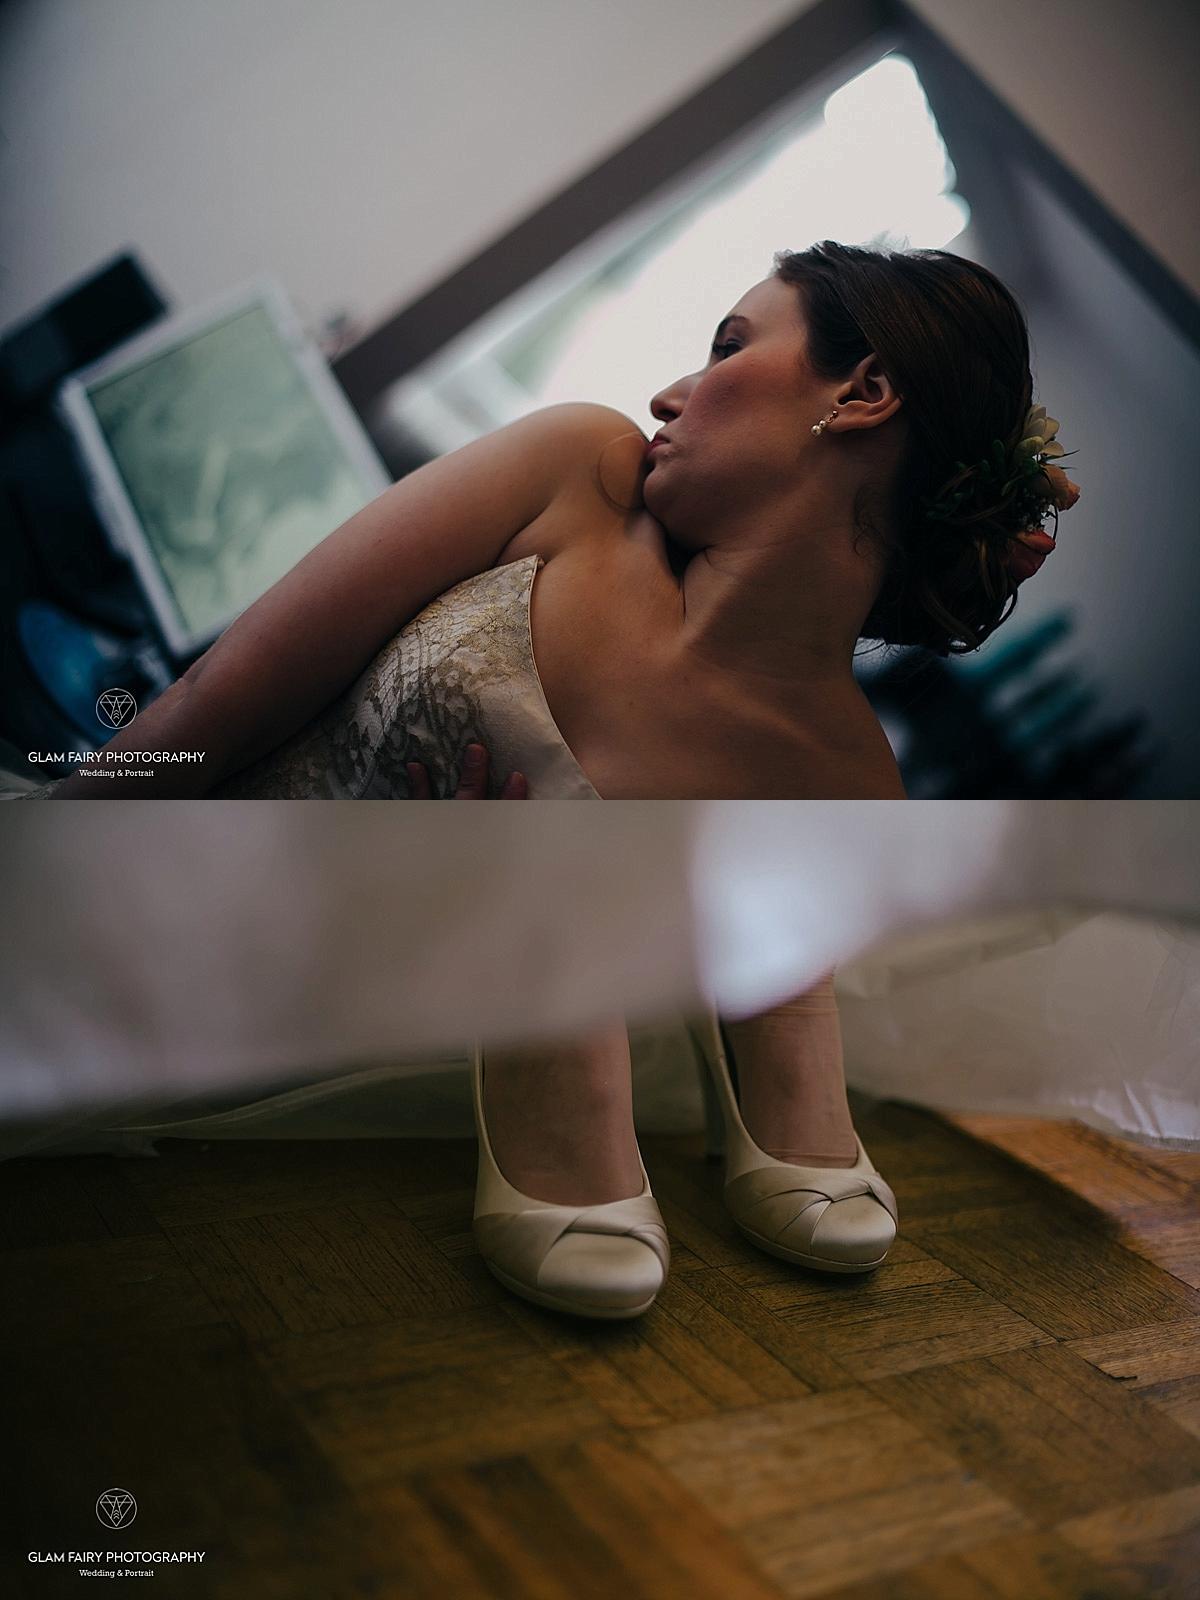 GlamFairyPhotography-mariage-hiver-pressigny-les-pins-aryz_0007